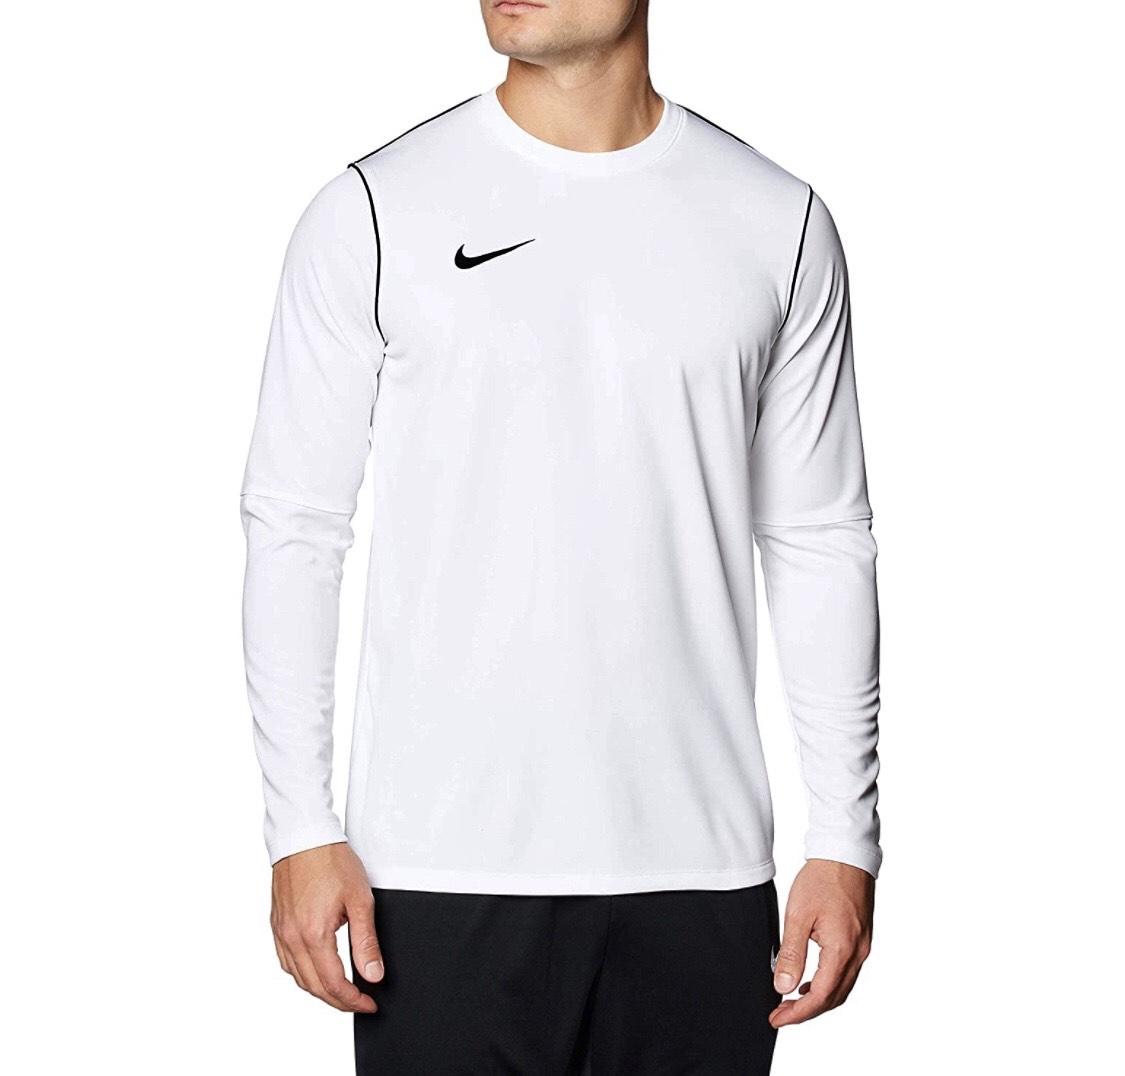 Camiseta manga larga NIKE hombres talla S.